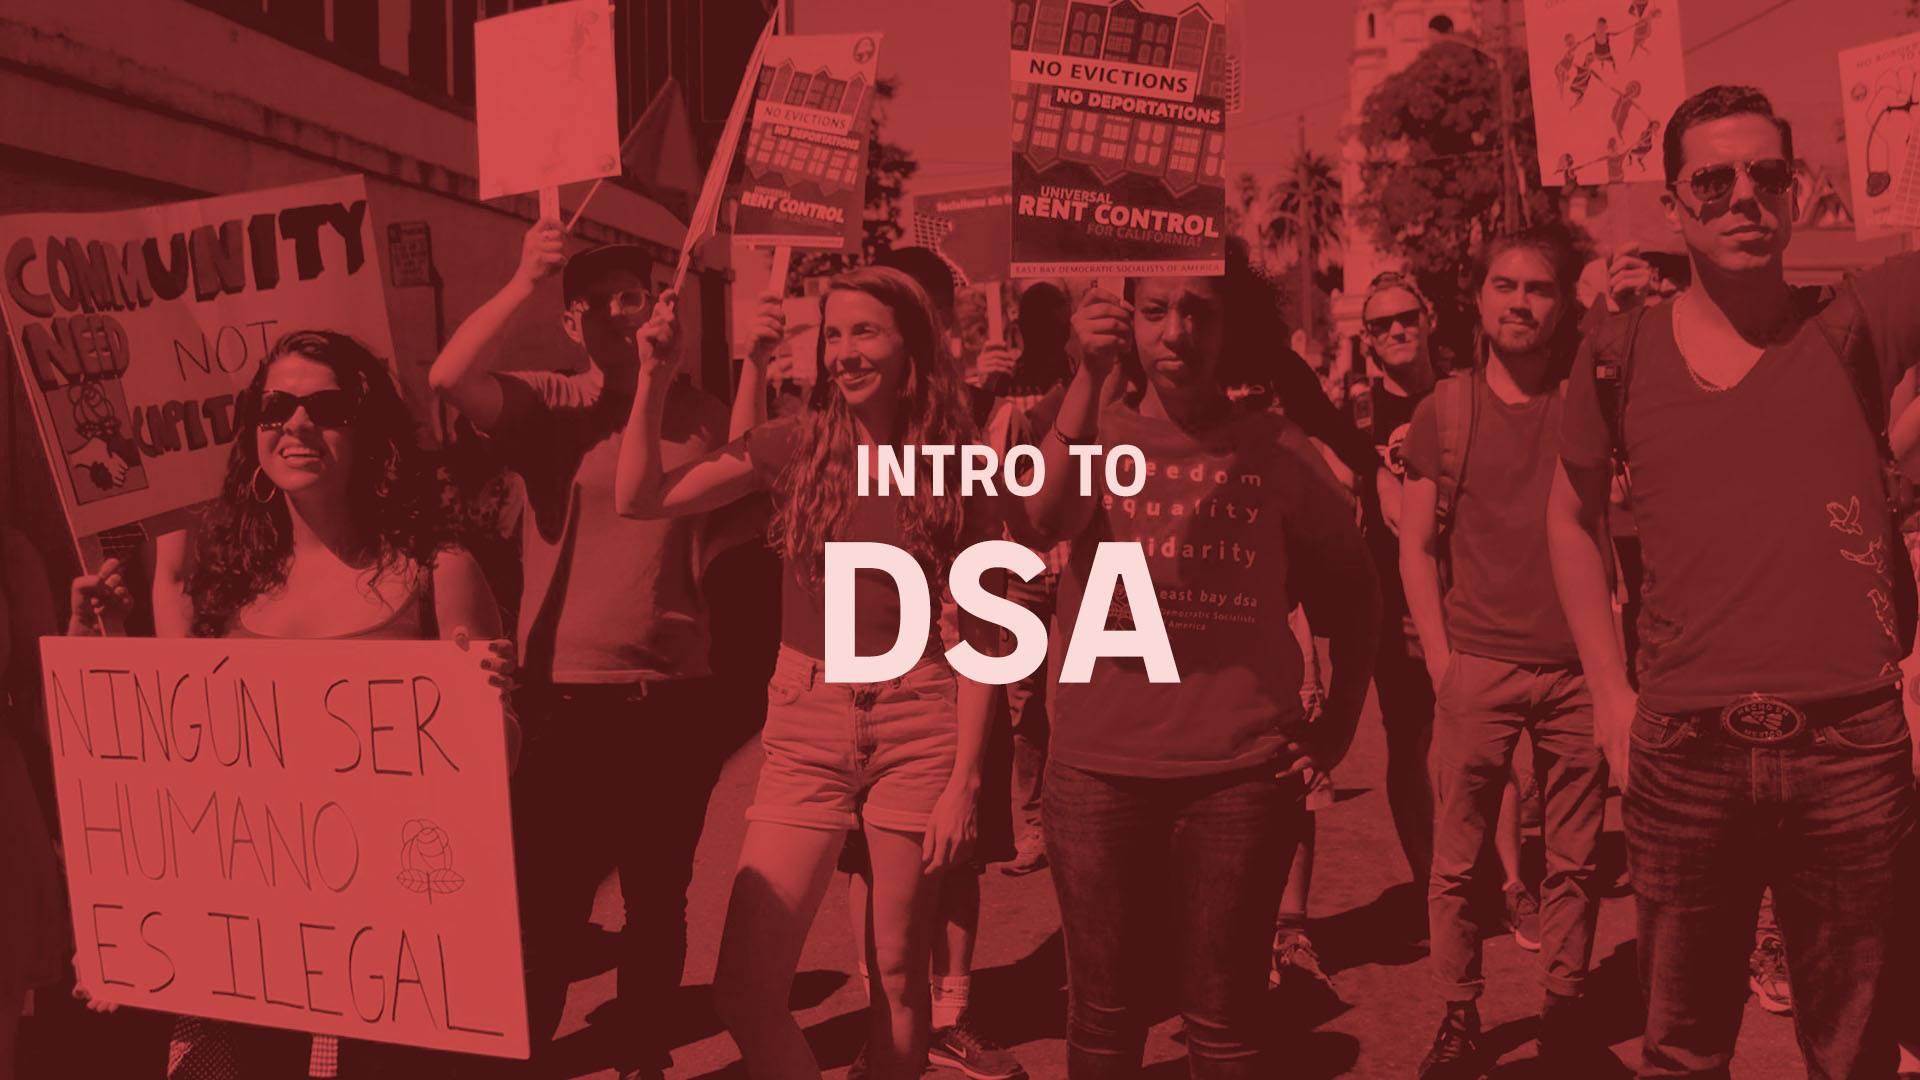 Intro to DSA